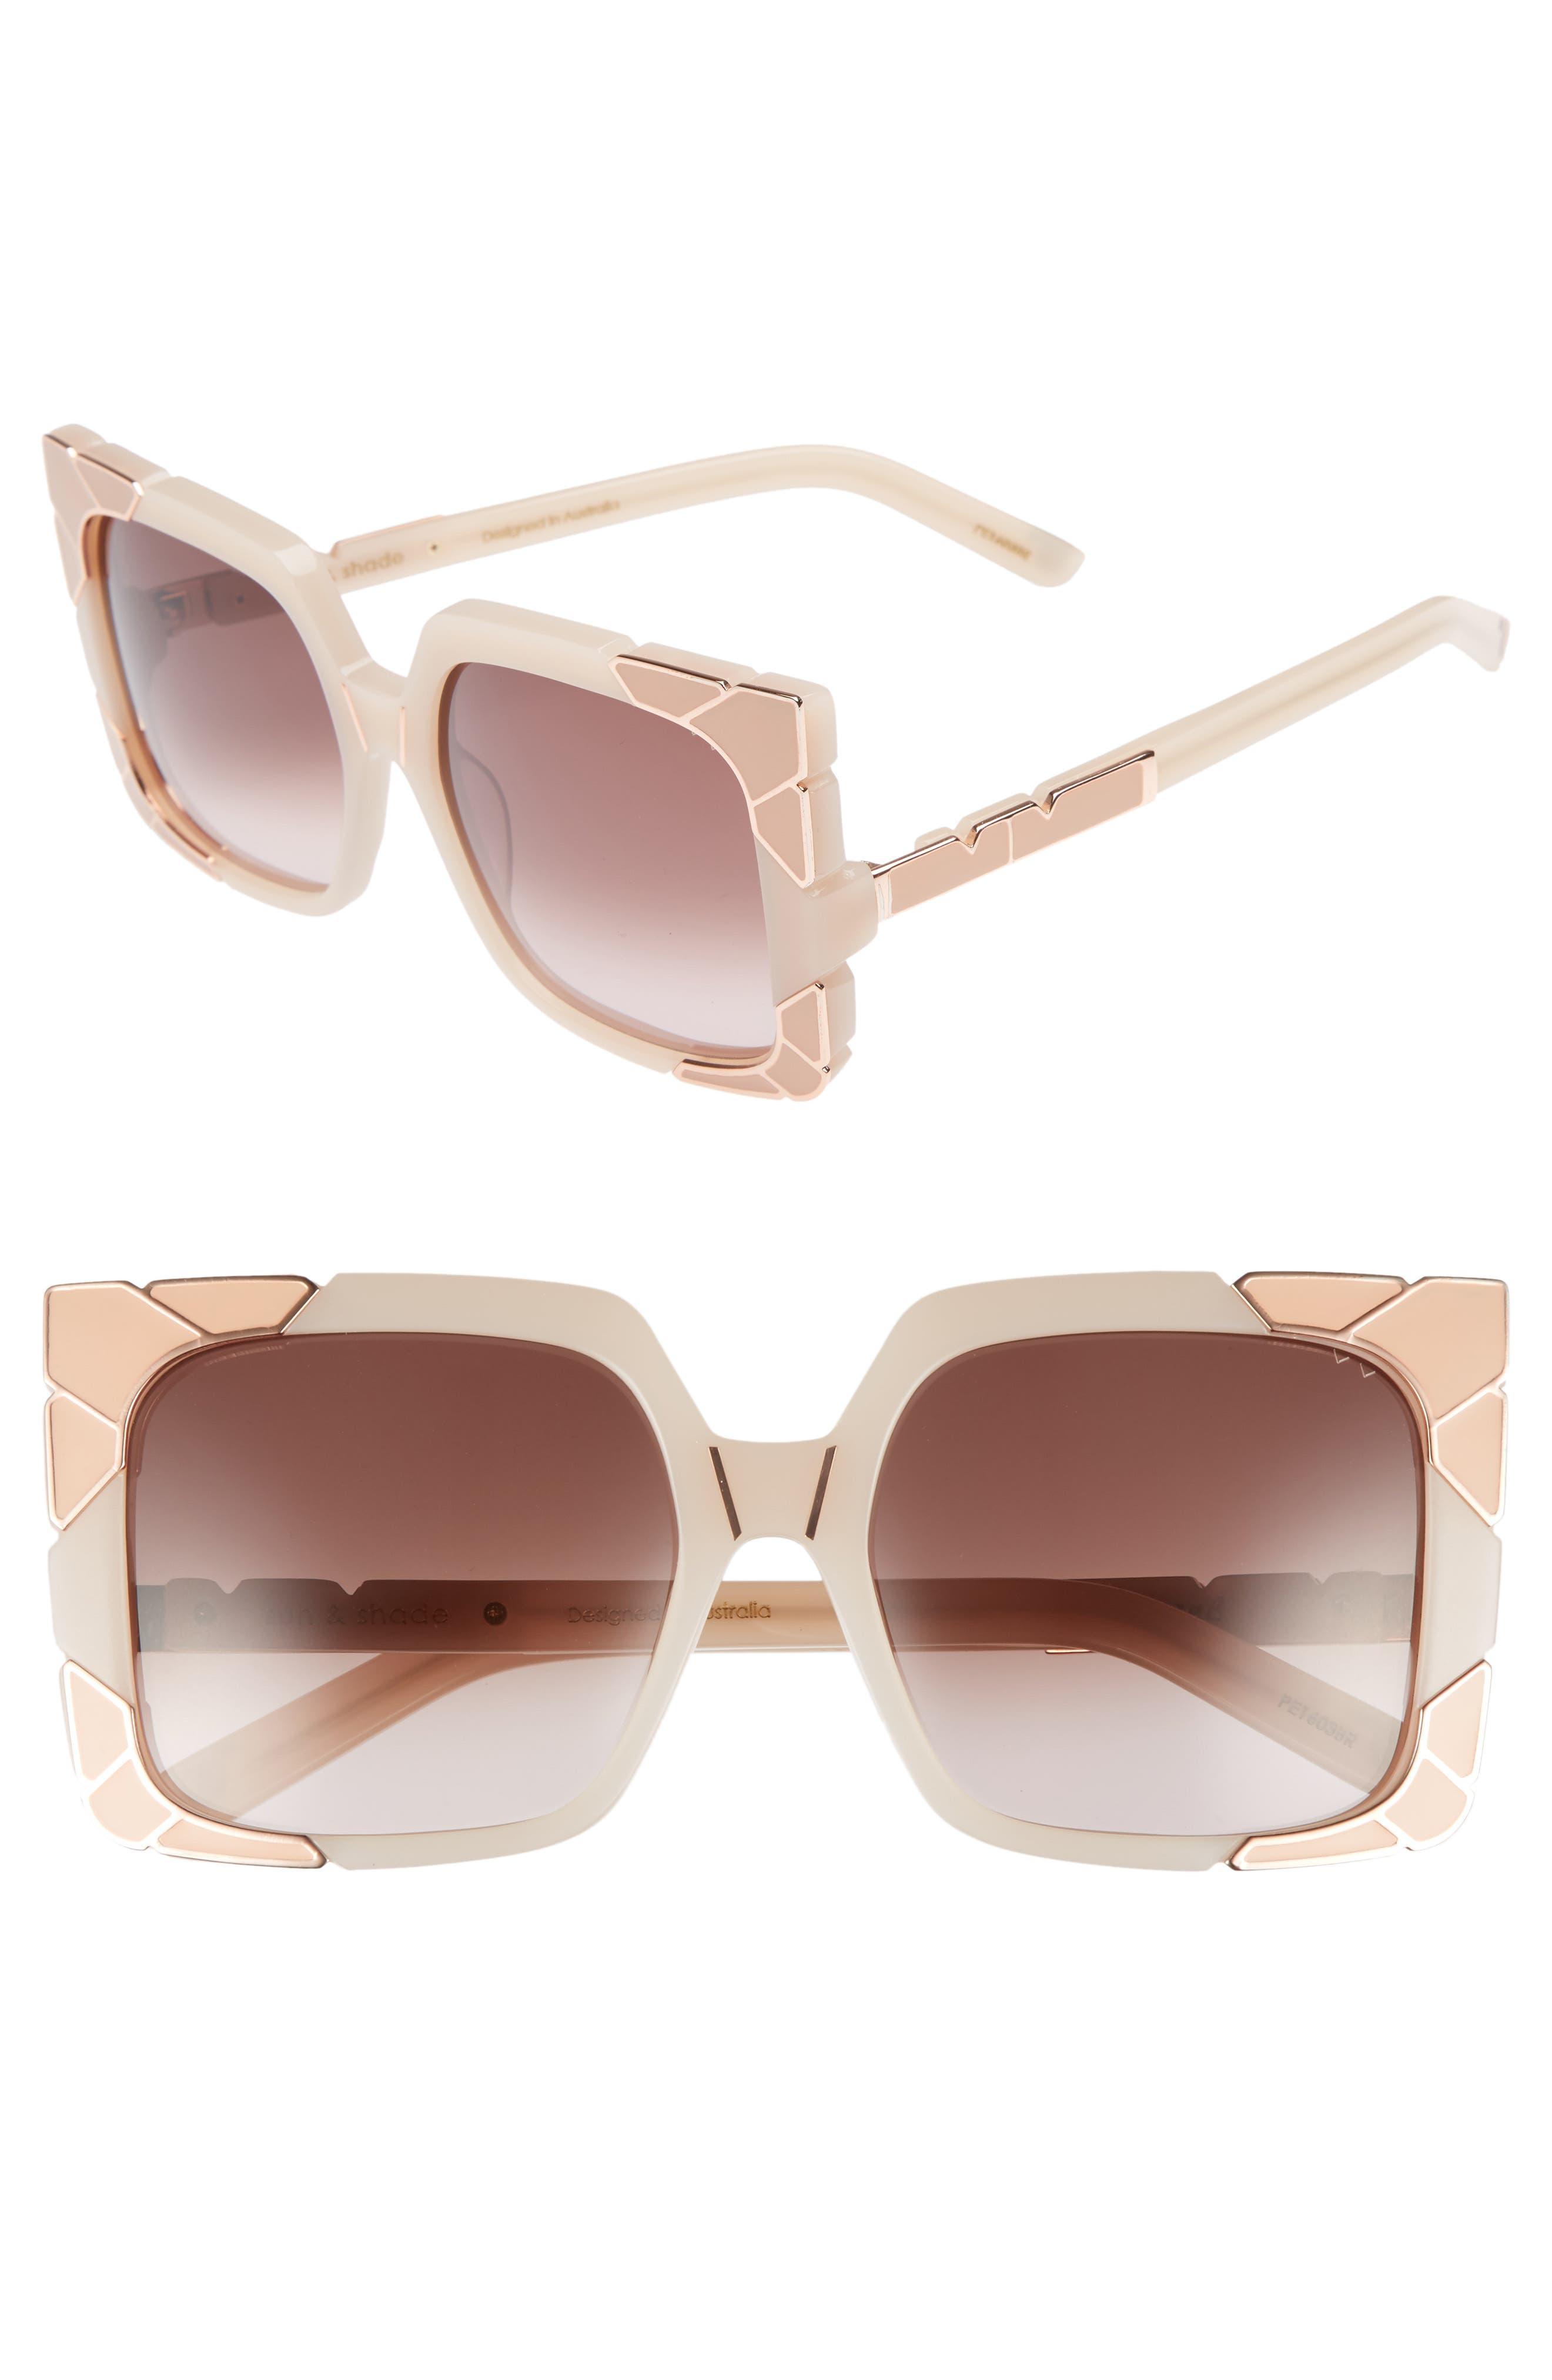 Sun & Shade 55mm Square Retro Sunglasses,                         Main,                         color, BLUSH/ ROSE GOLD/ BROWN